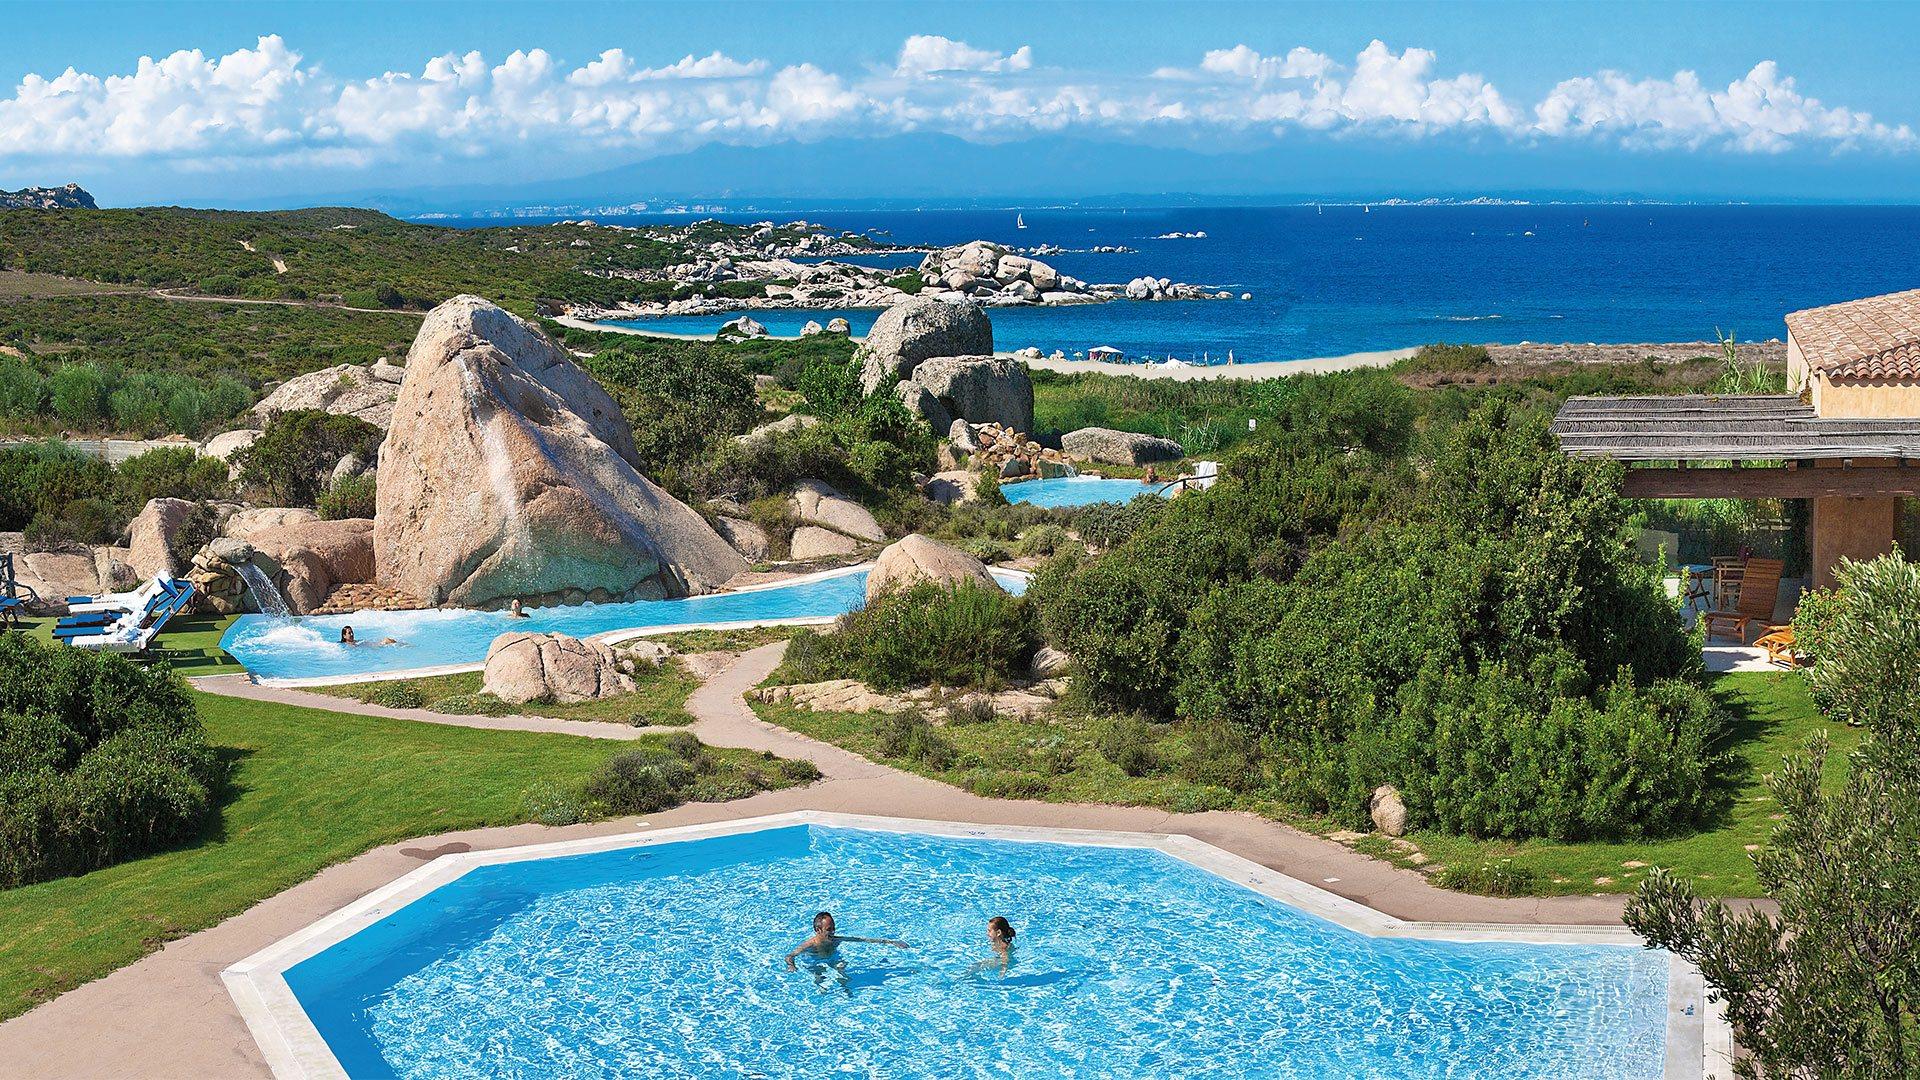 resort-valle-erica-slider-thalasso-piscina-sardegna-mare-1